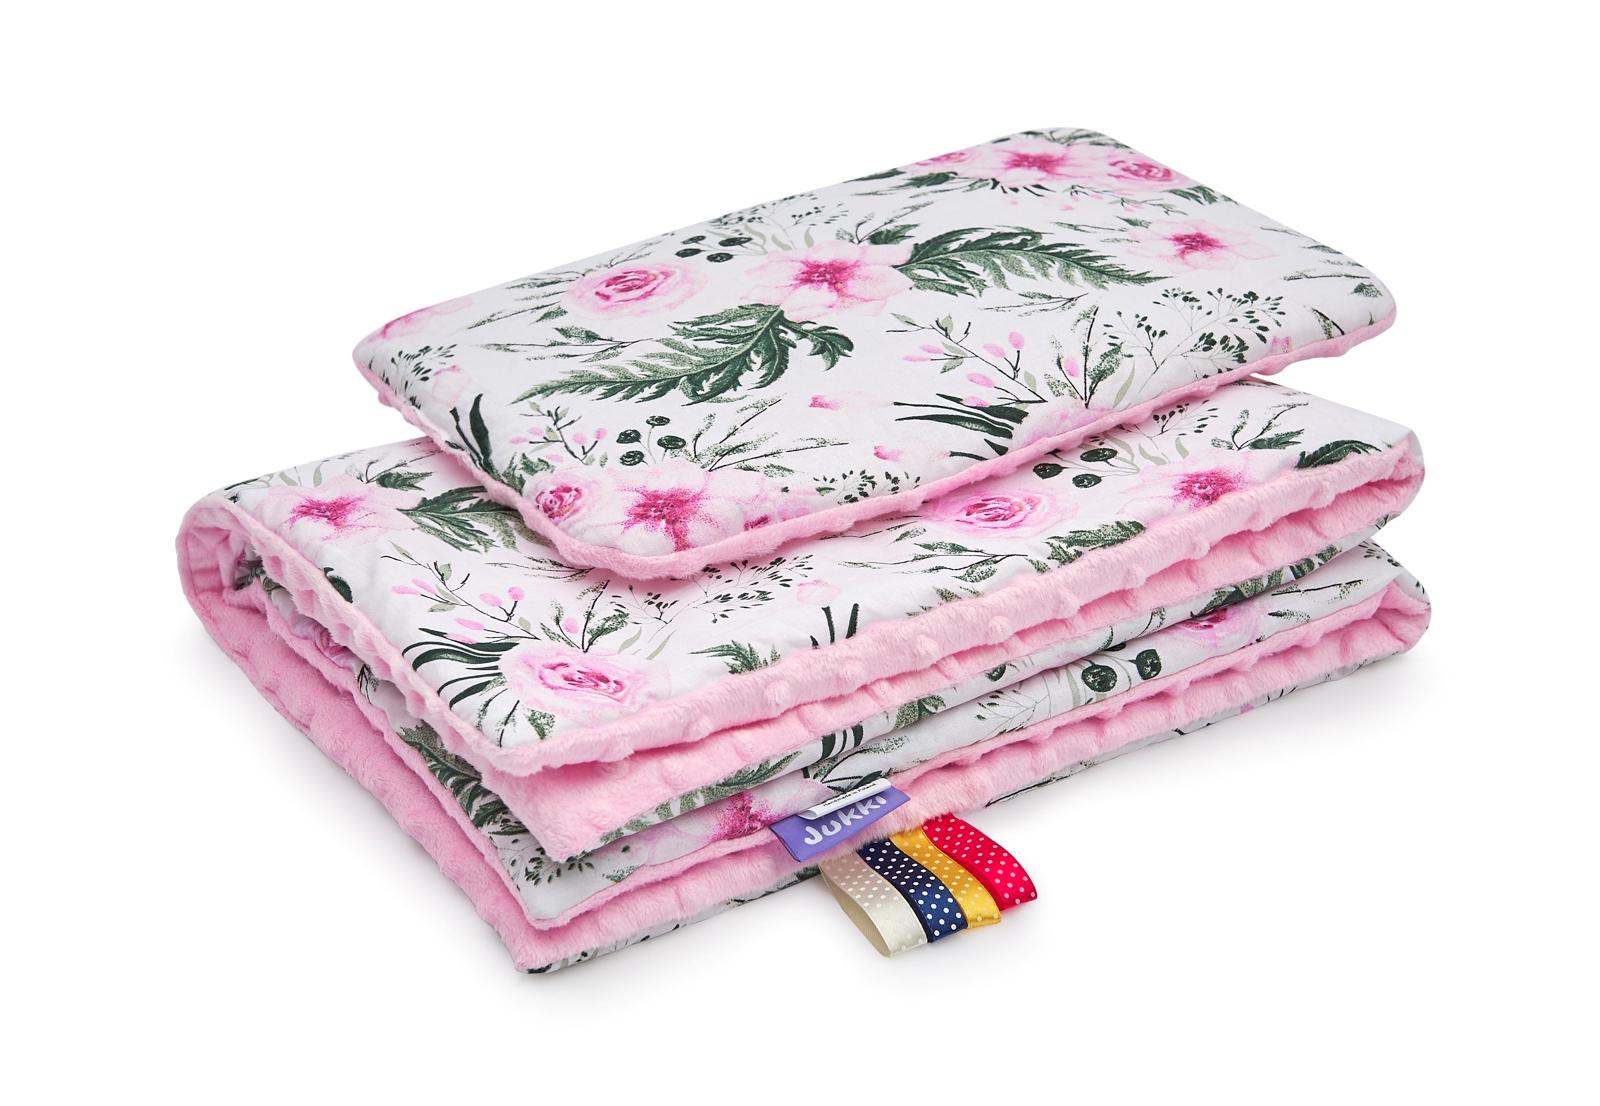 kocyk-płaska-poduszka-ingarden-pink-Jukki